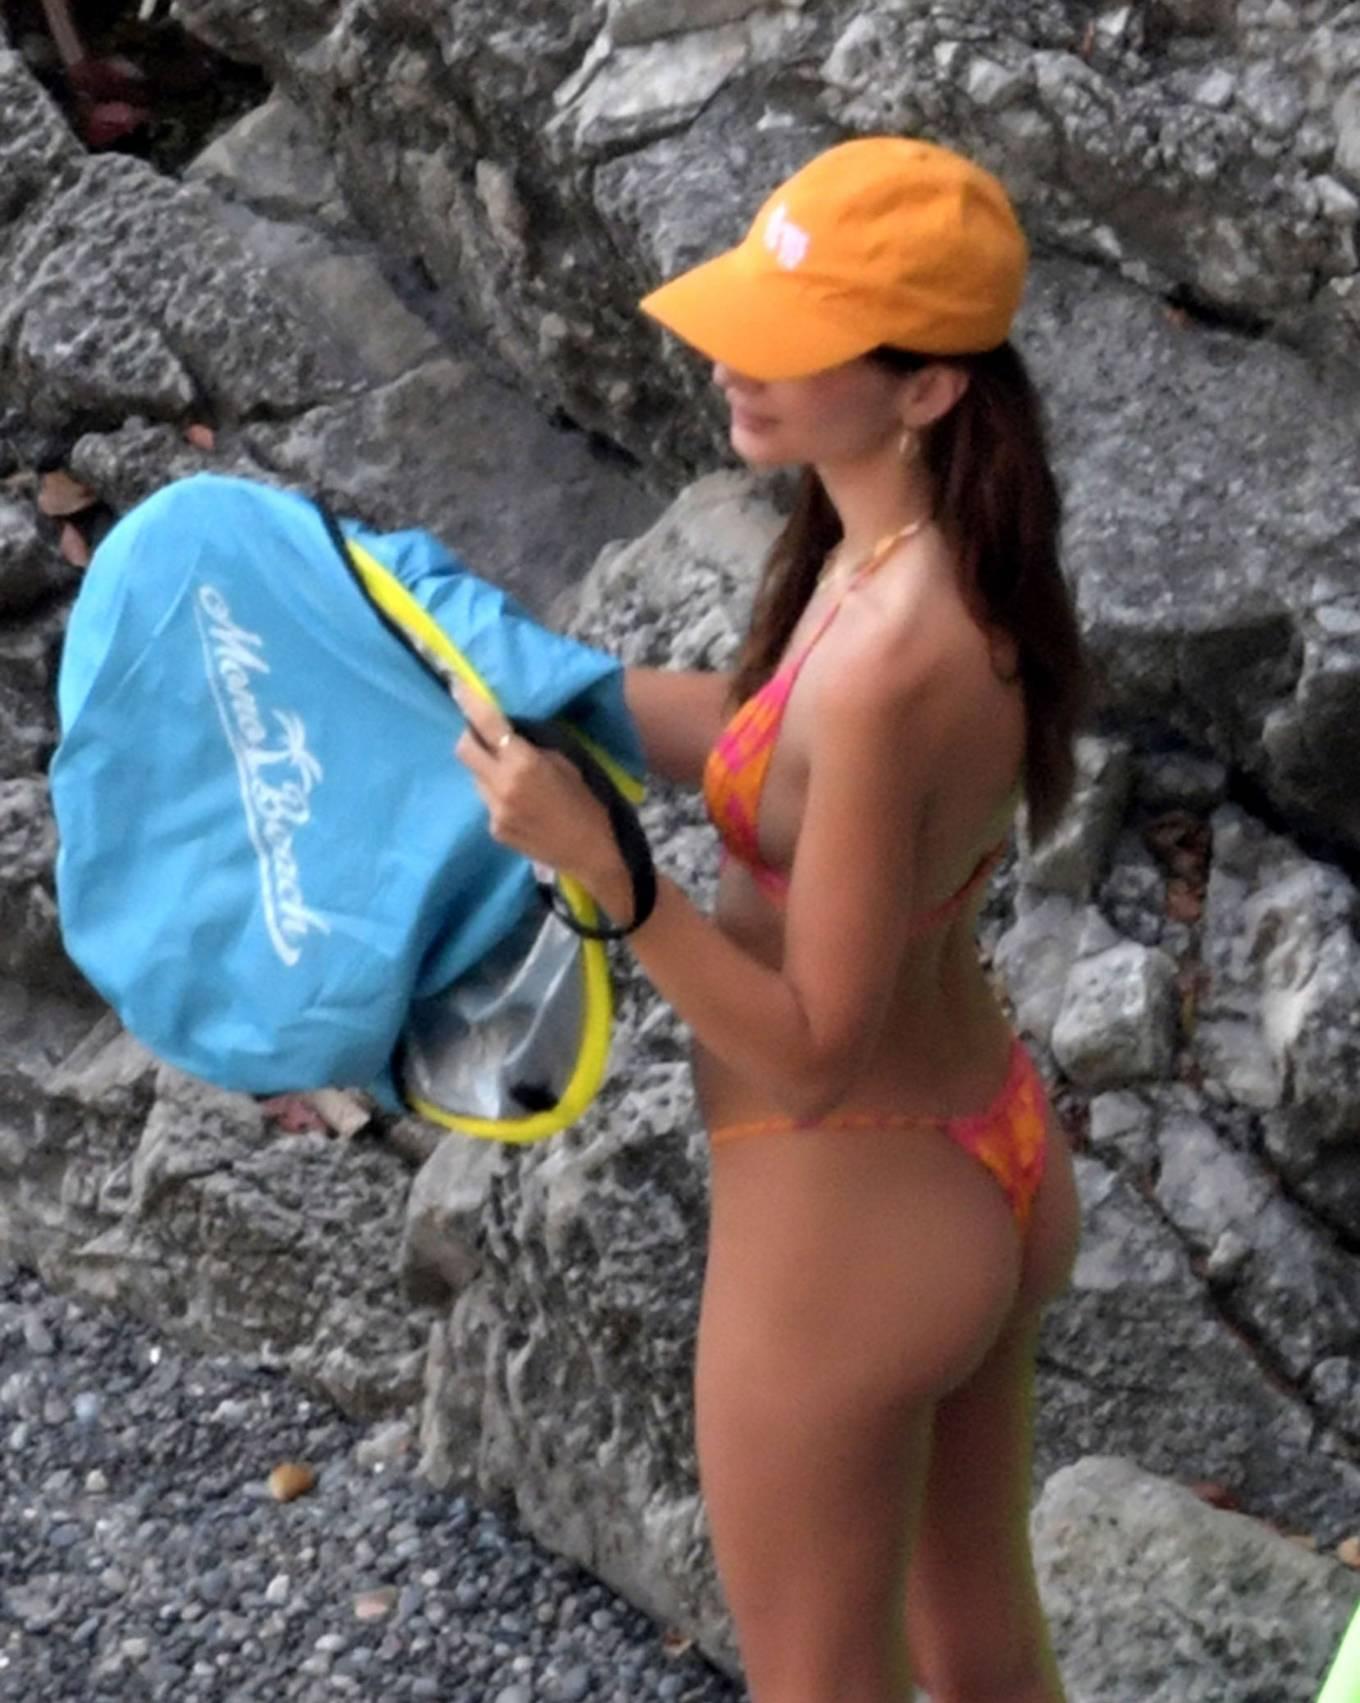 Emily-Ratajkowski-bi-color-bikini-top-bikini-autumn-winter-2021